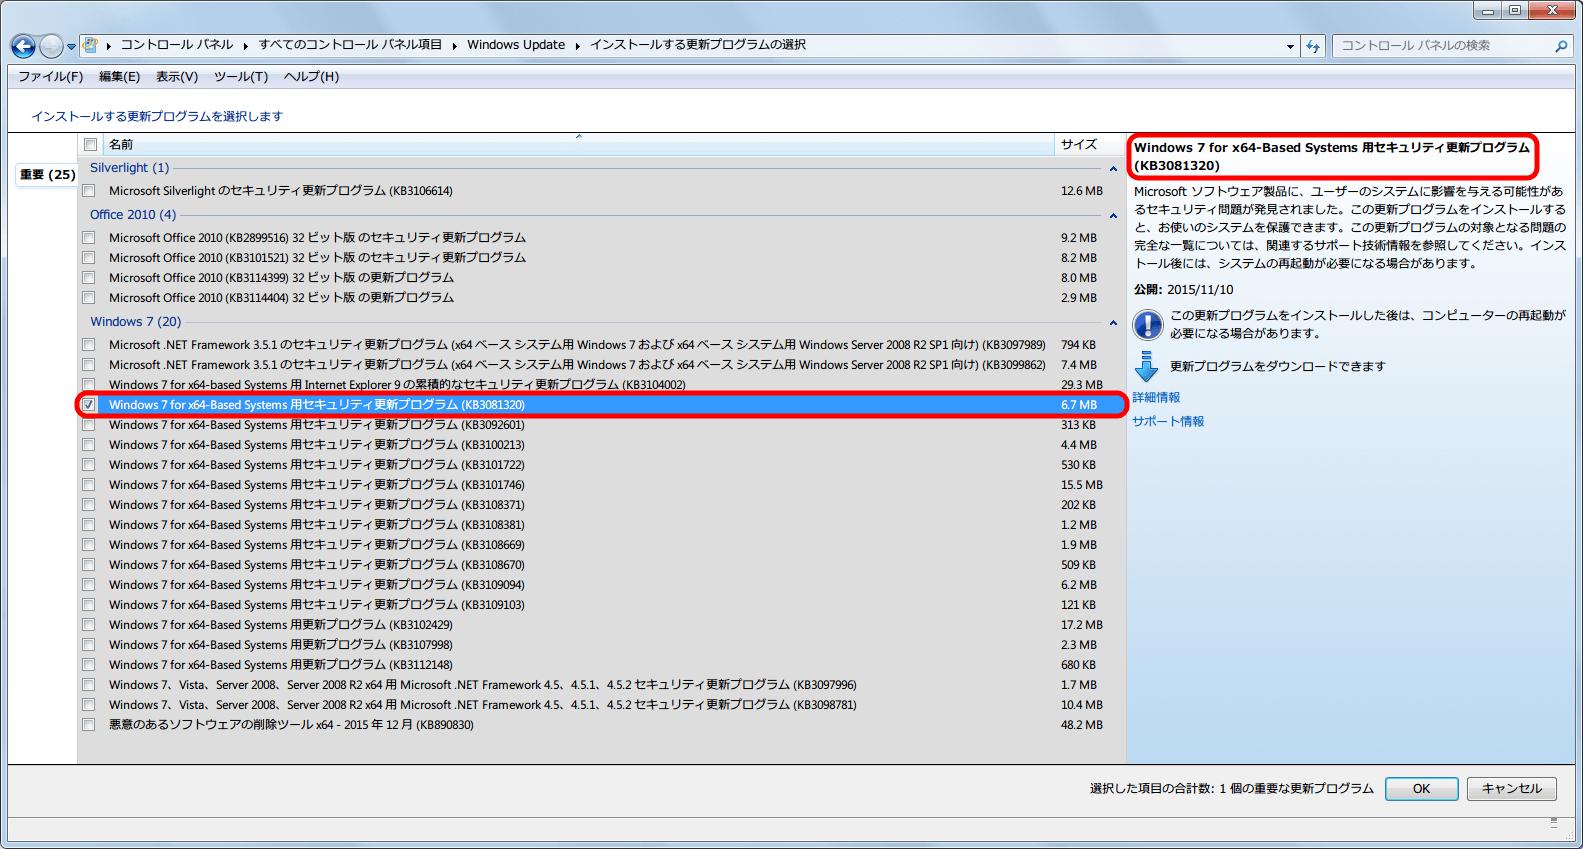 Windows Update 2015年11月分 2番目 KB3081320 インストール後、再起動